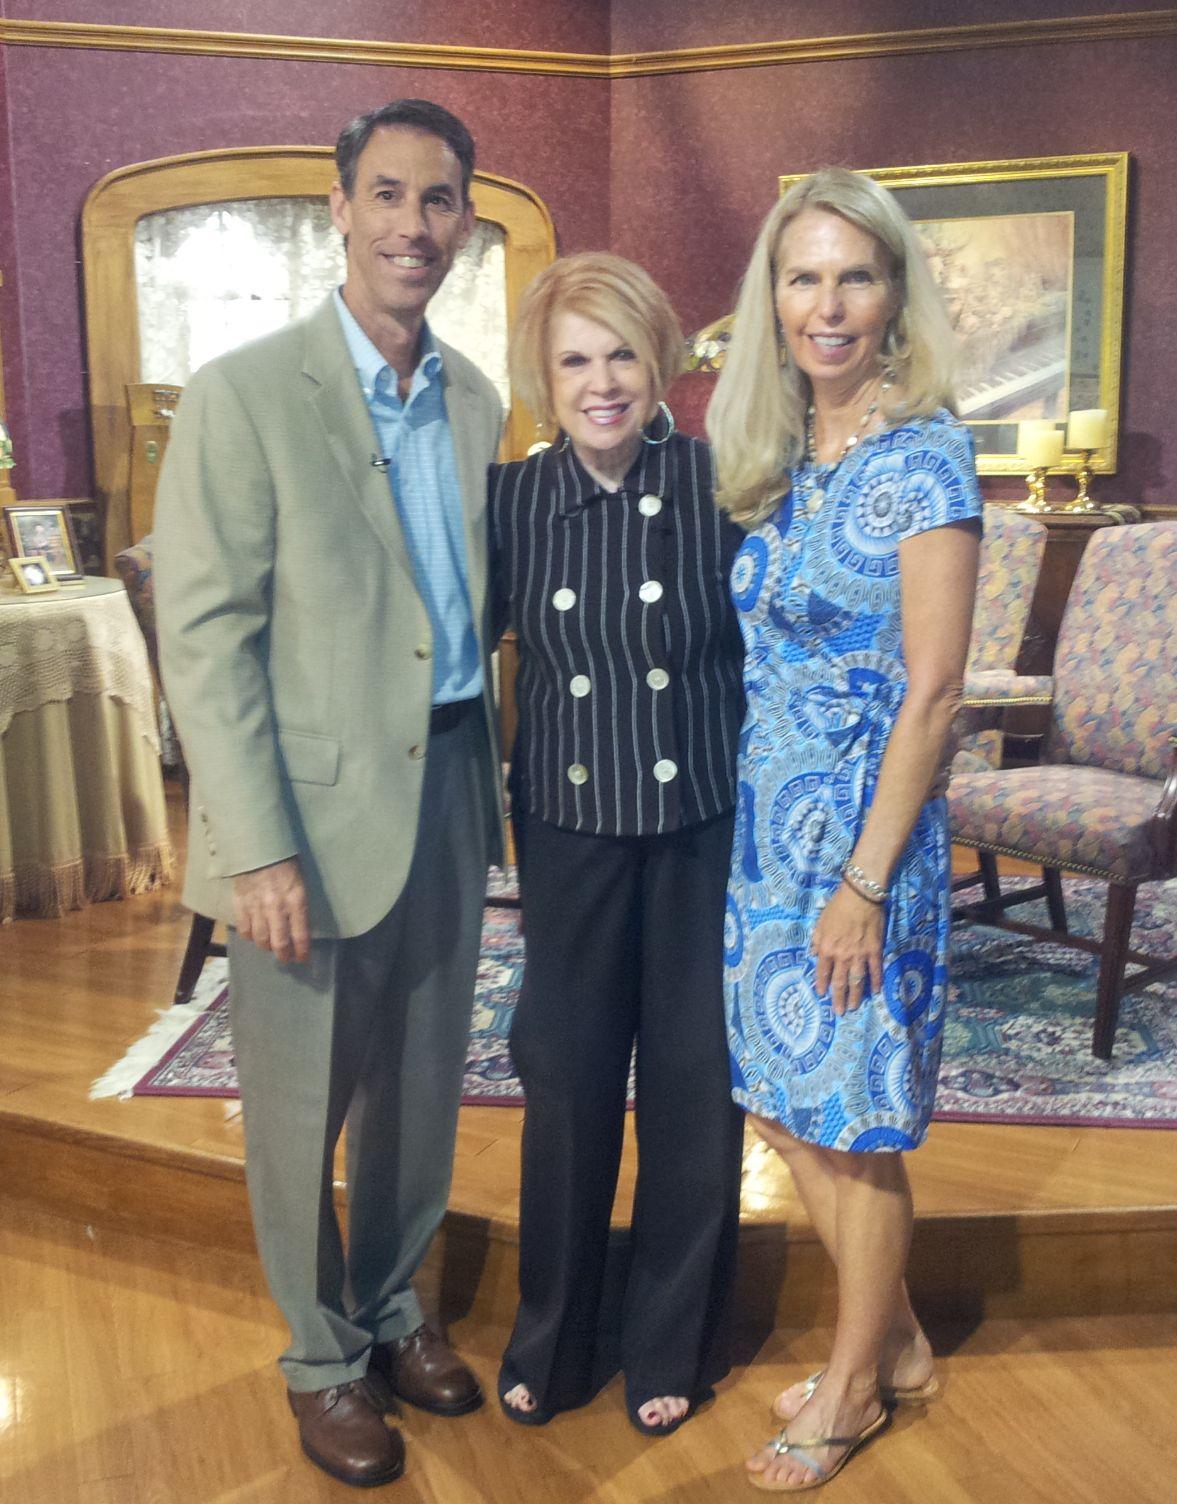 Jim, Arthelene & Peggy